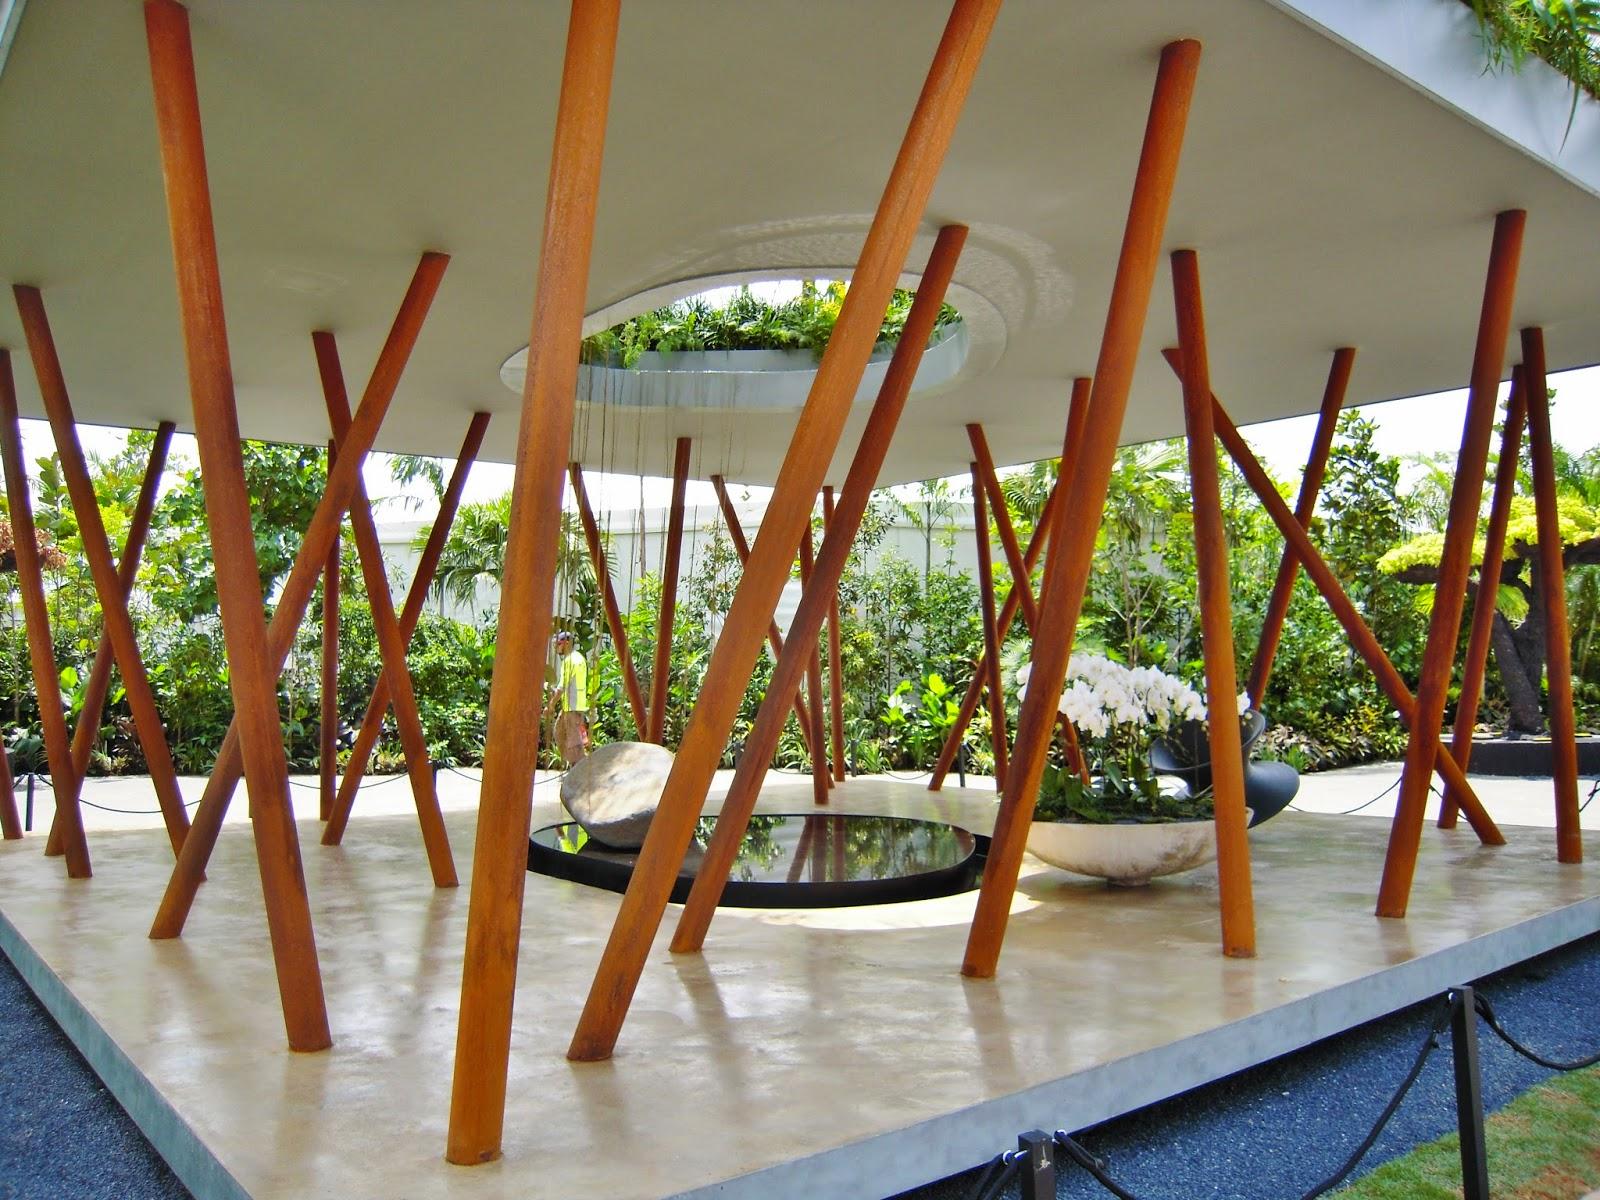 UMI & TSURU: Singapore Garden Festival Part 2